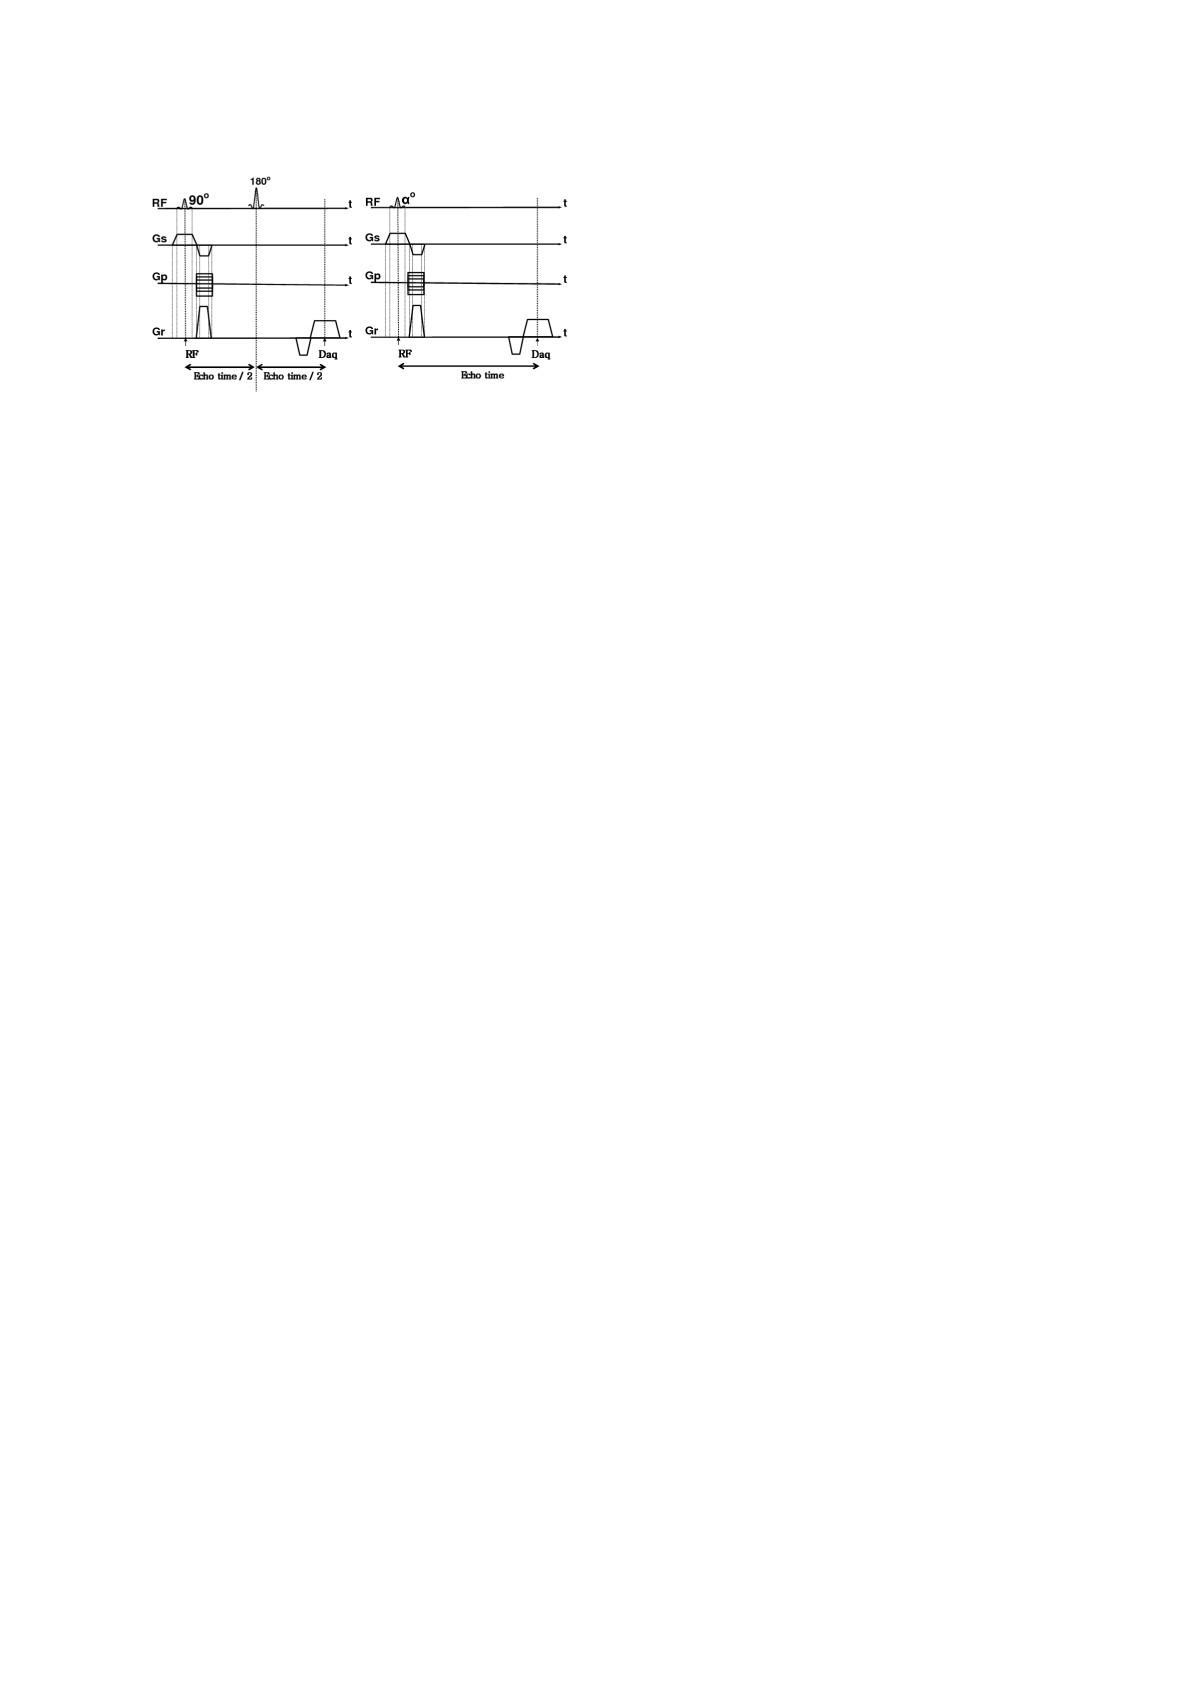 https://static-content.springer.com/image/art%3A10.1186%2Fs40543-014-0025-2/MediaObjects/40543_2014_Article_25_Fig1_HTML.jpg